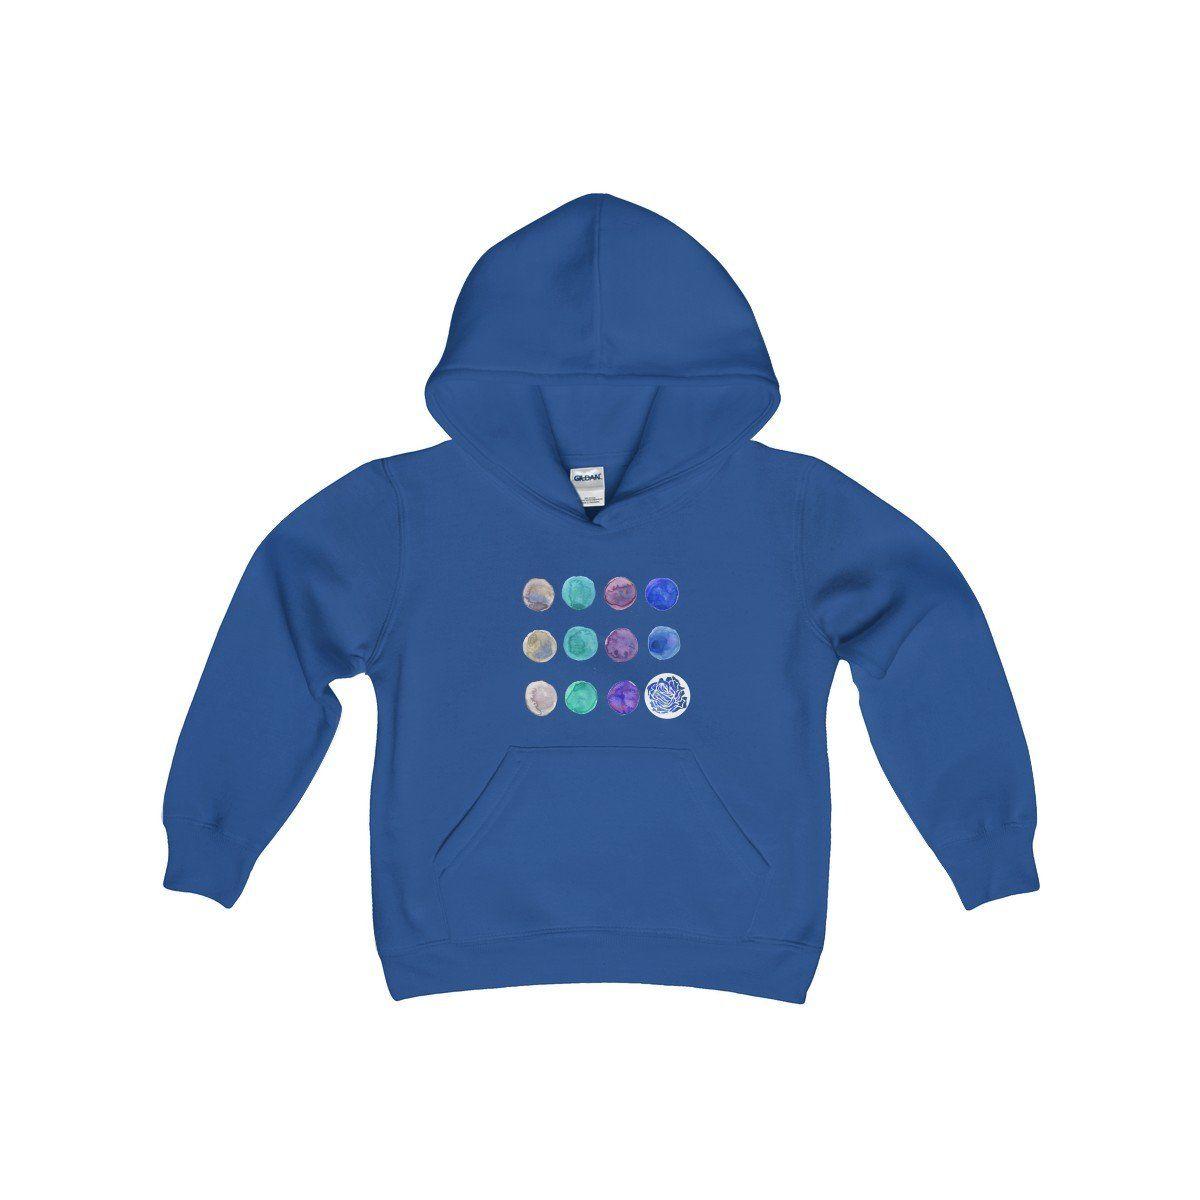 White Cute Polka Dots Kids Heavy Blend Hooded Sweatshirt Made In Usa Sweatshirts Hooded Sweatshirts Cool Shirts [ 1200 x 1200 Pixel ]